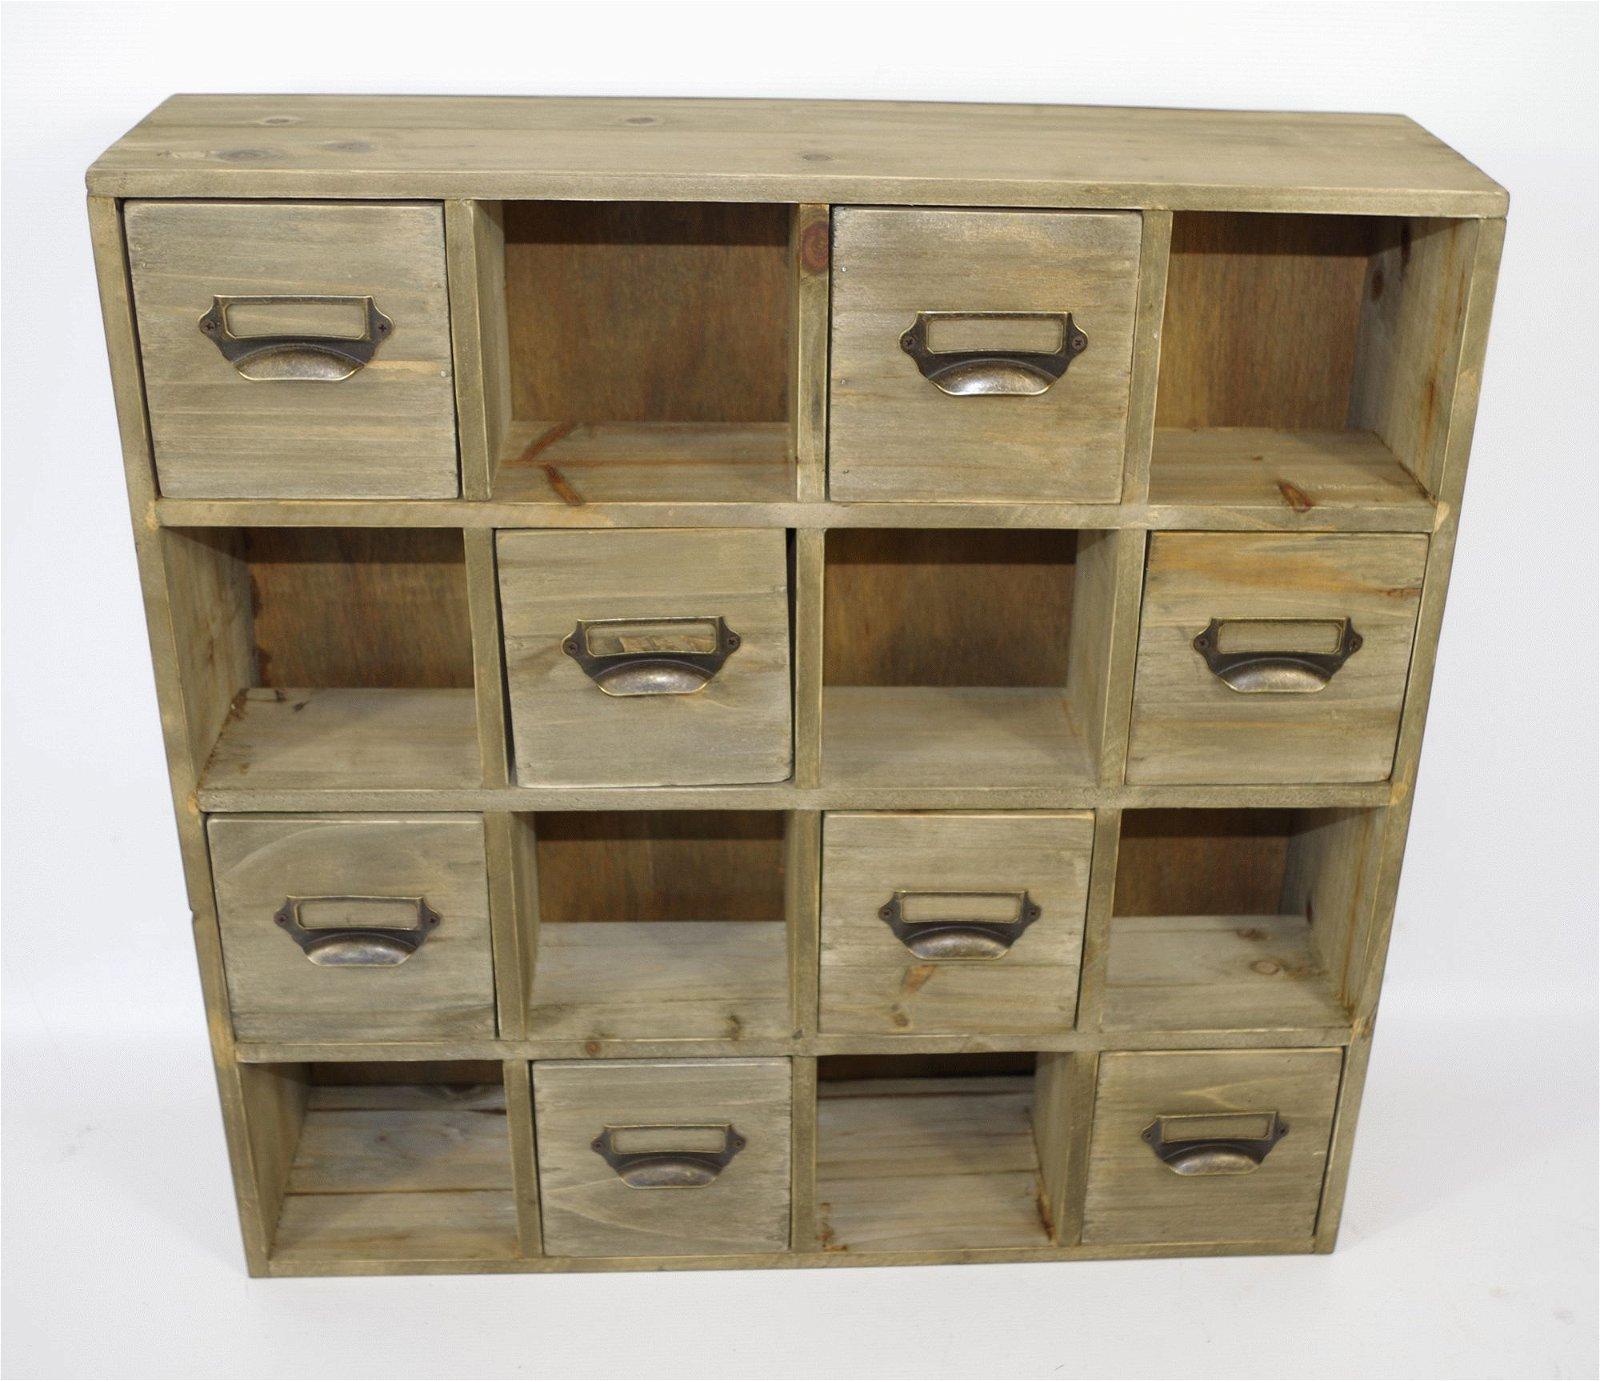 Multidrawer Storage Unit Square Handle 51 x 13 x 51cm